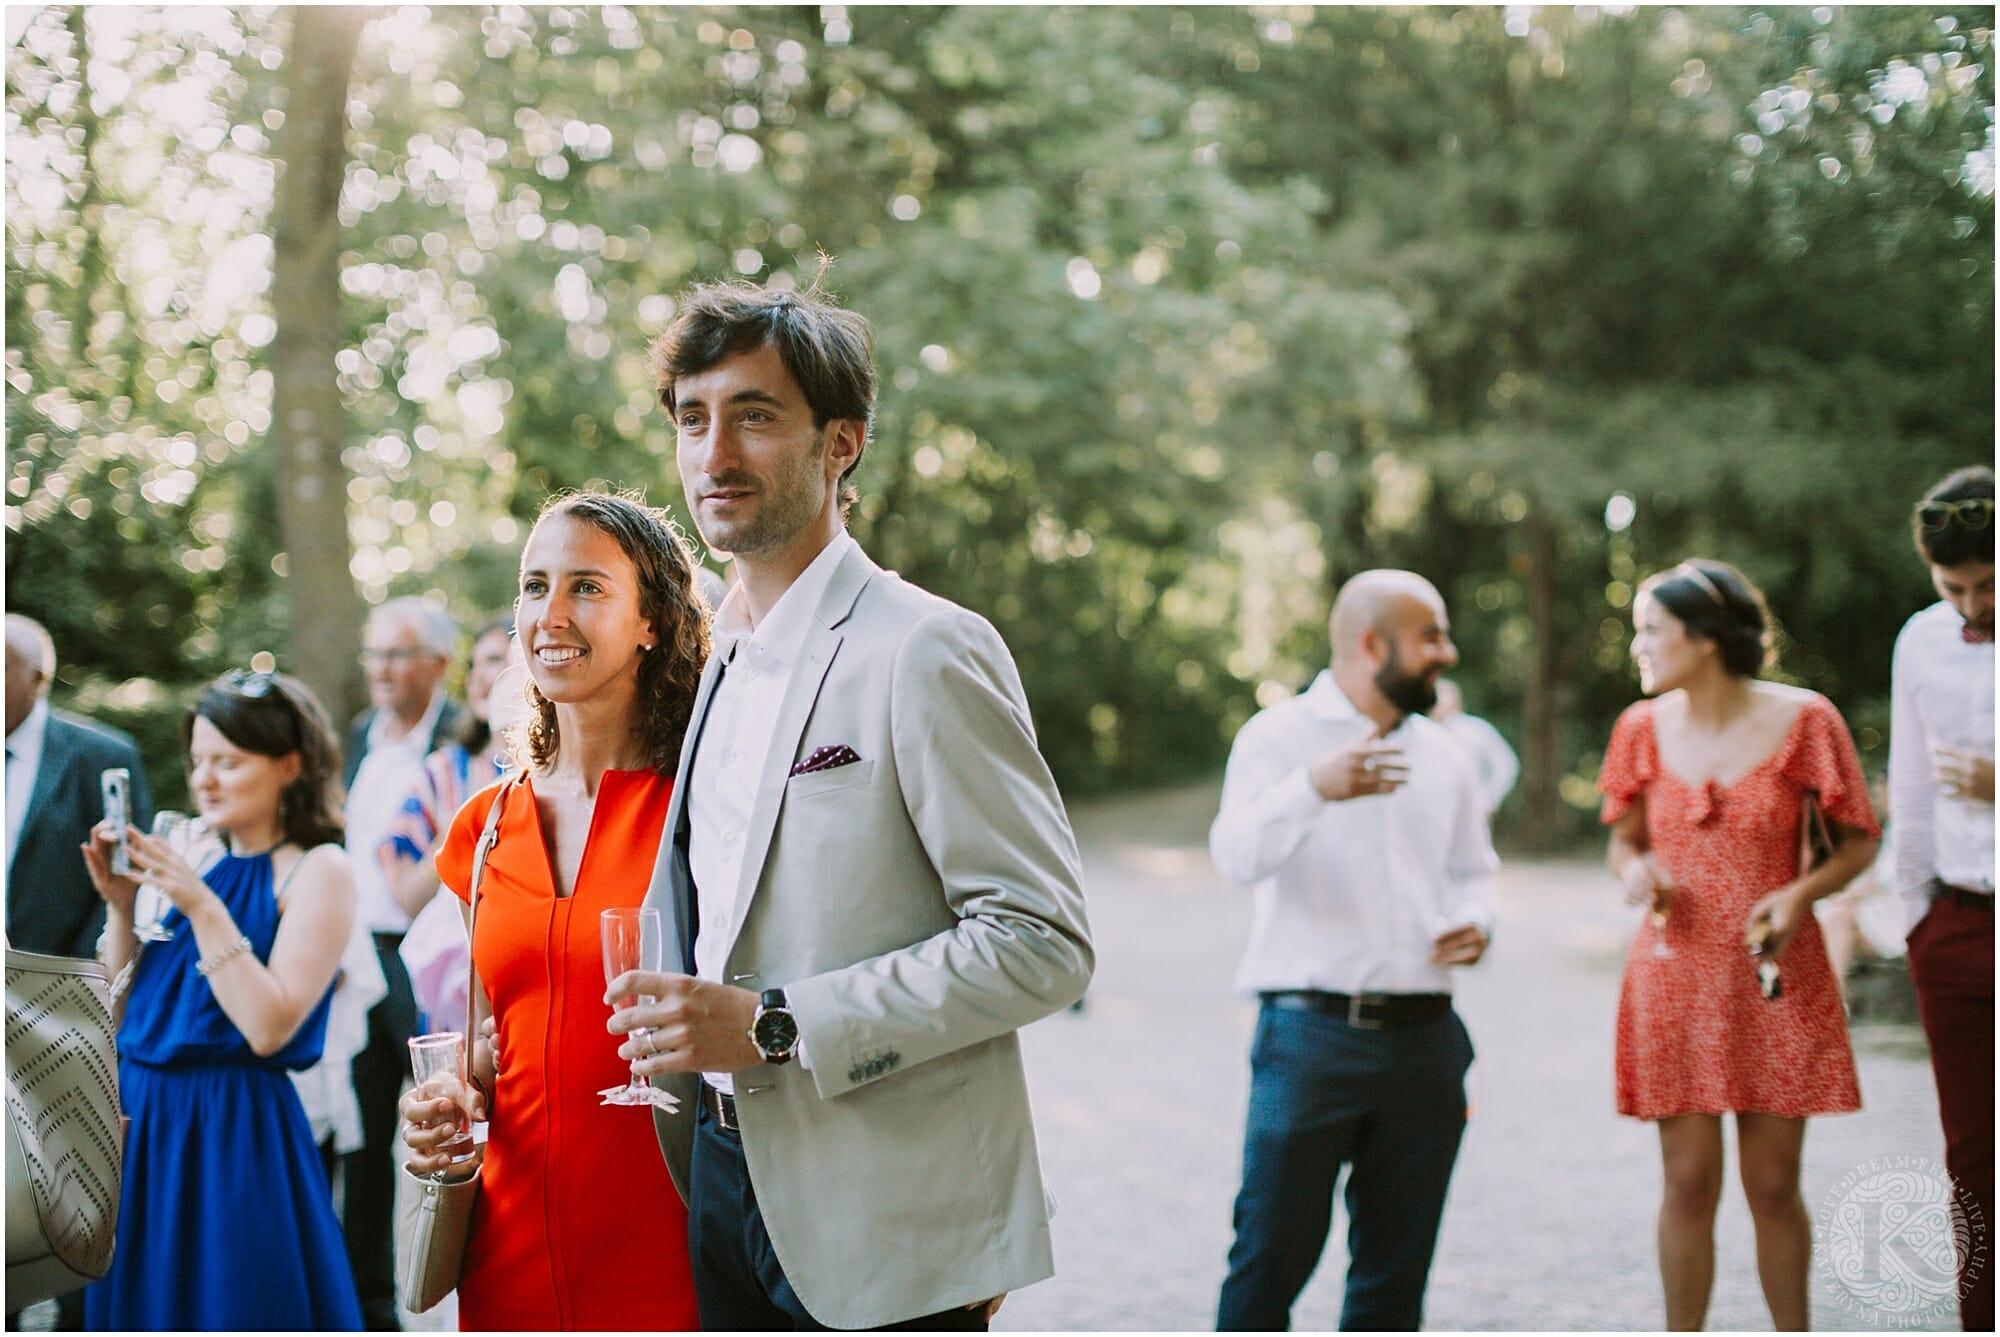 Kateryna-photos-photographe-mariage-chateau-des-3-fontaines-provence-avignon-vaucluse-sud_0069.jpg